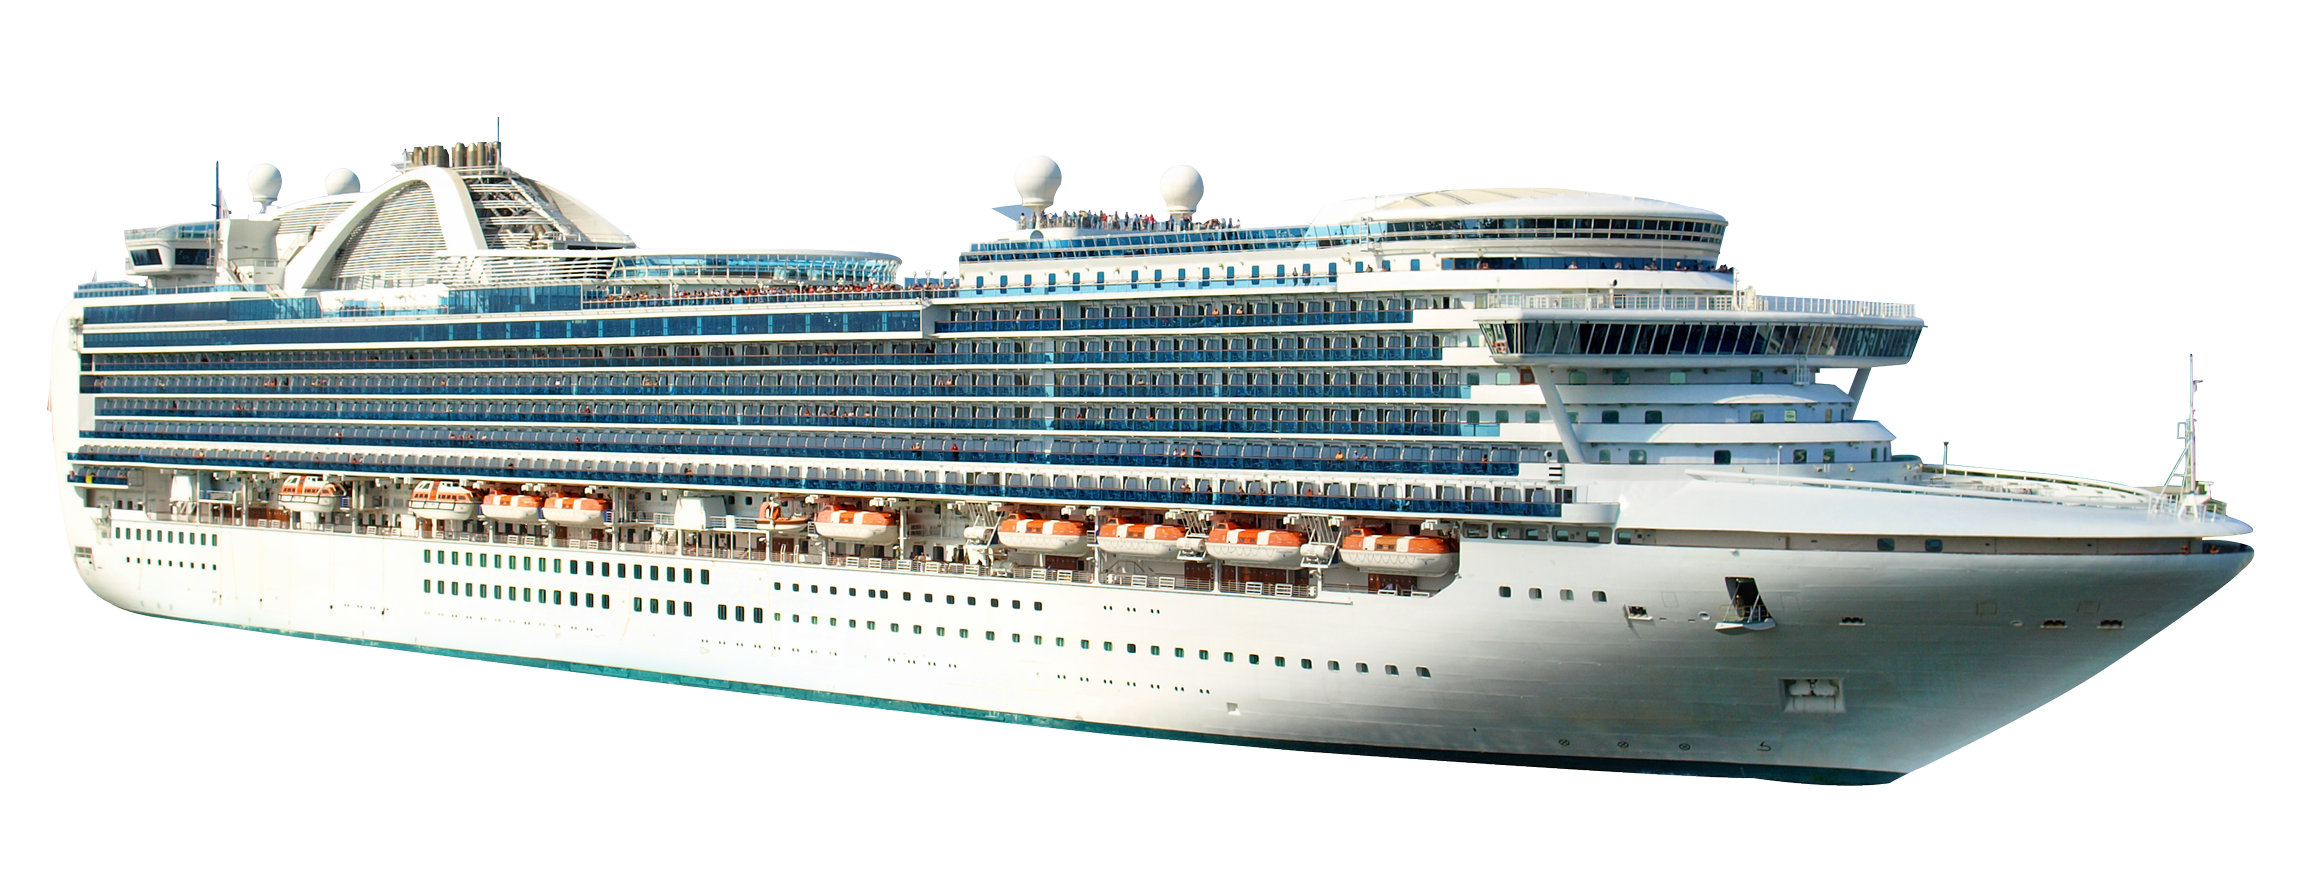 Cruise Ship PNG Transparent Image.